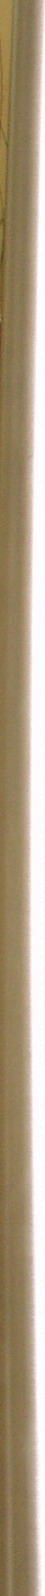 gold column.jpg